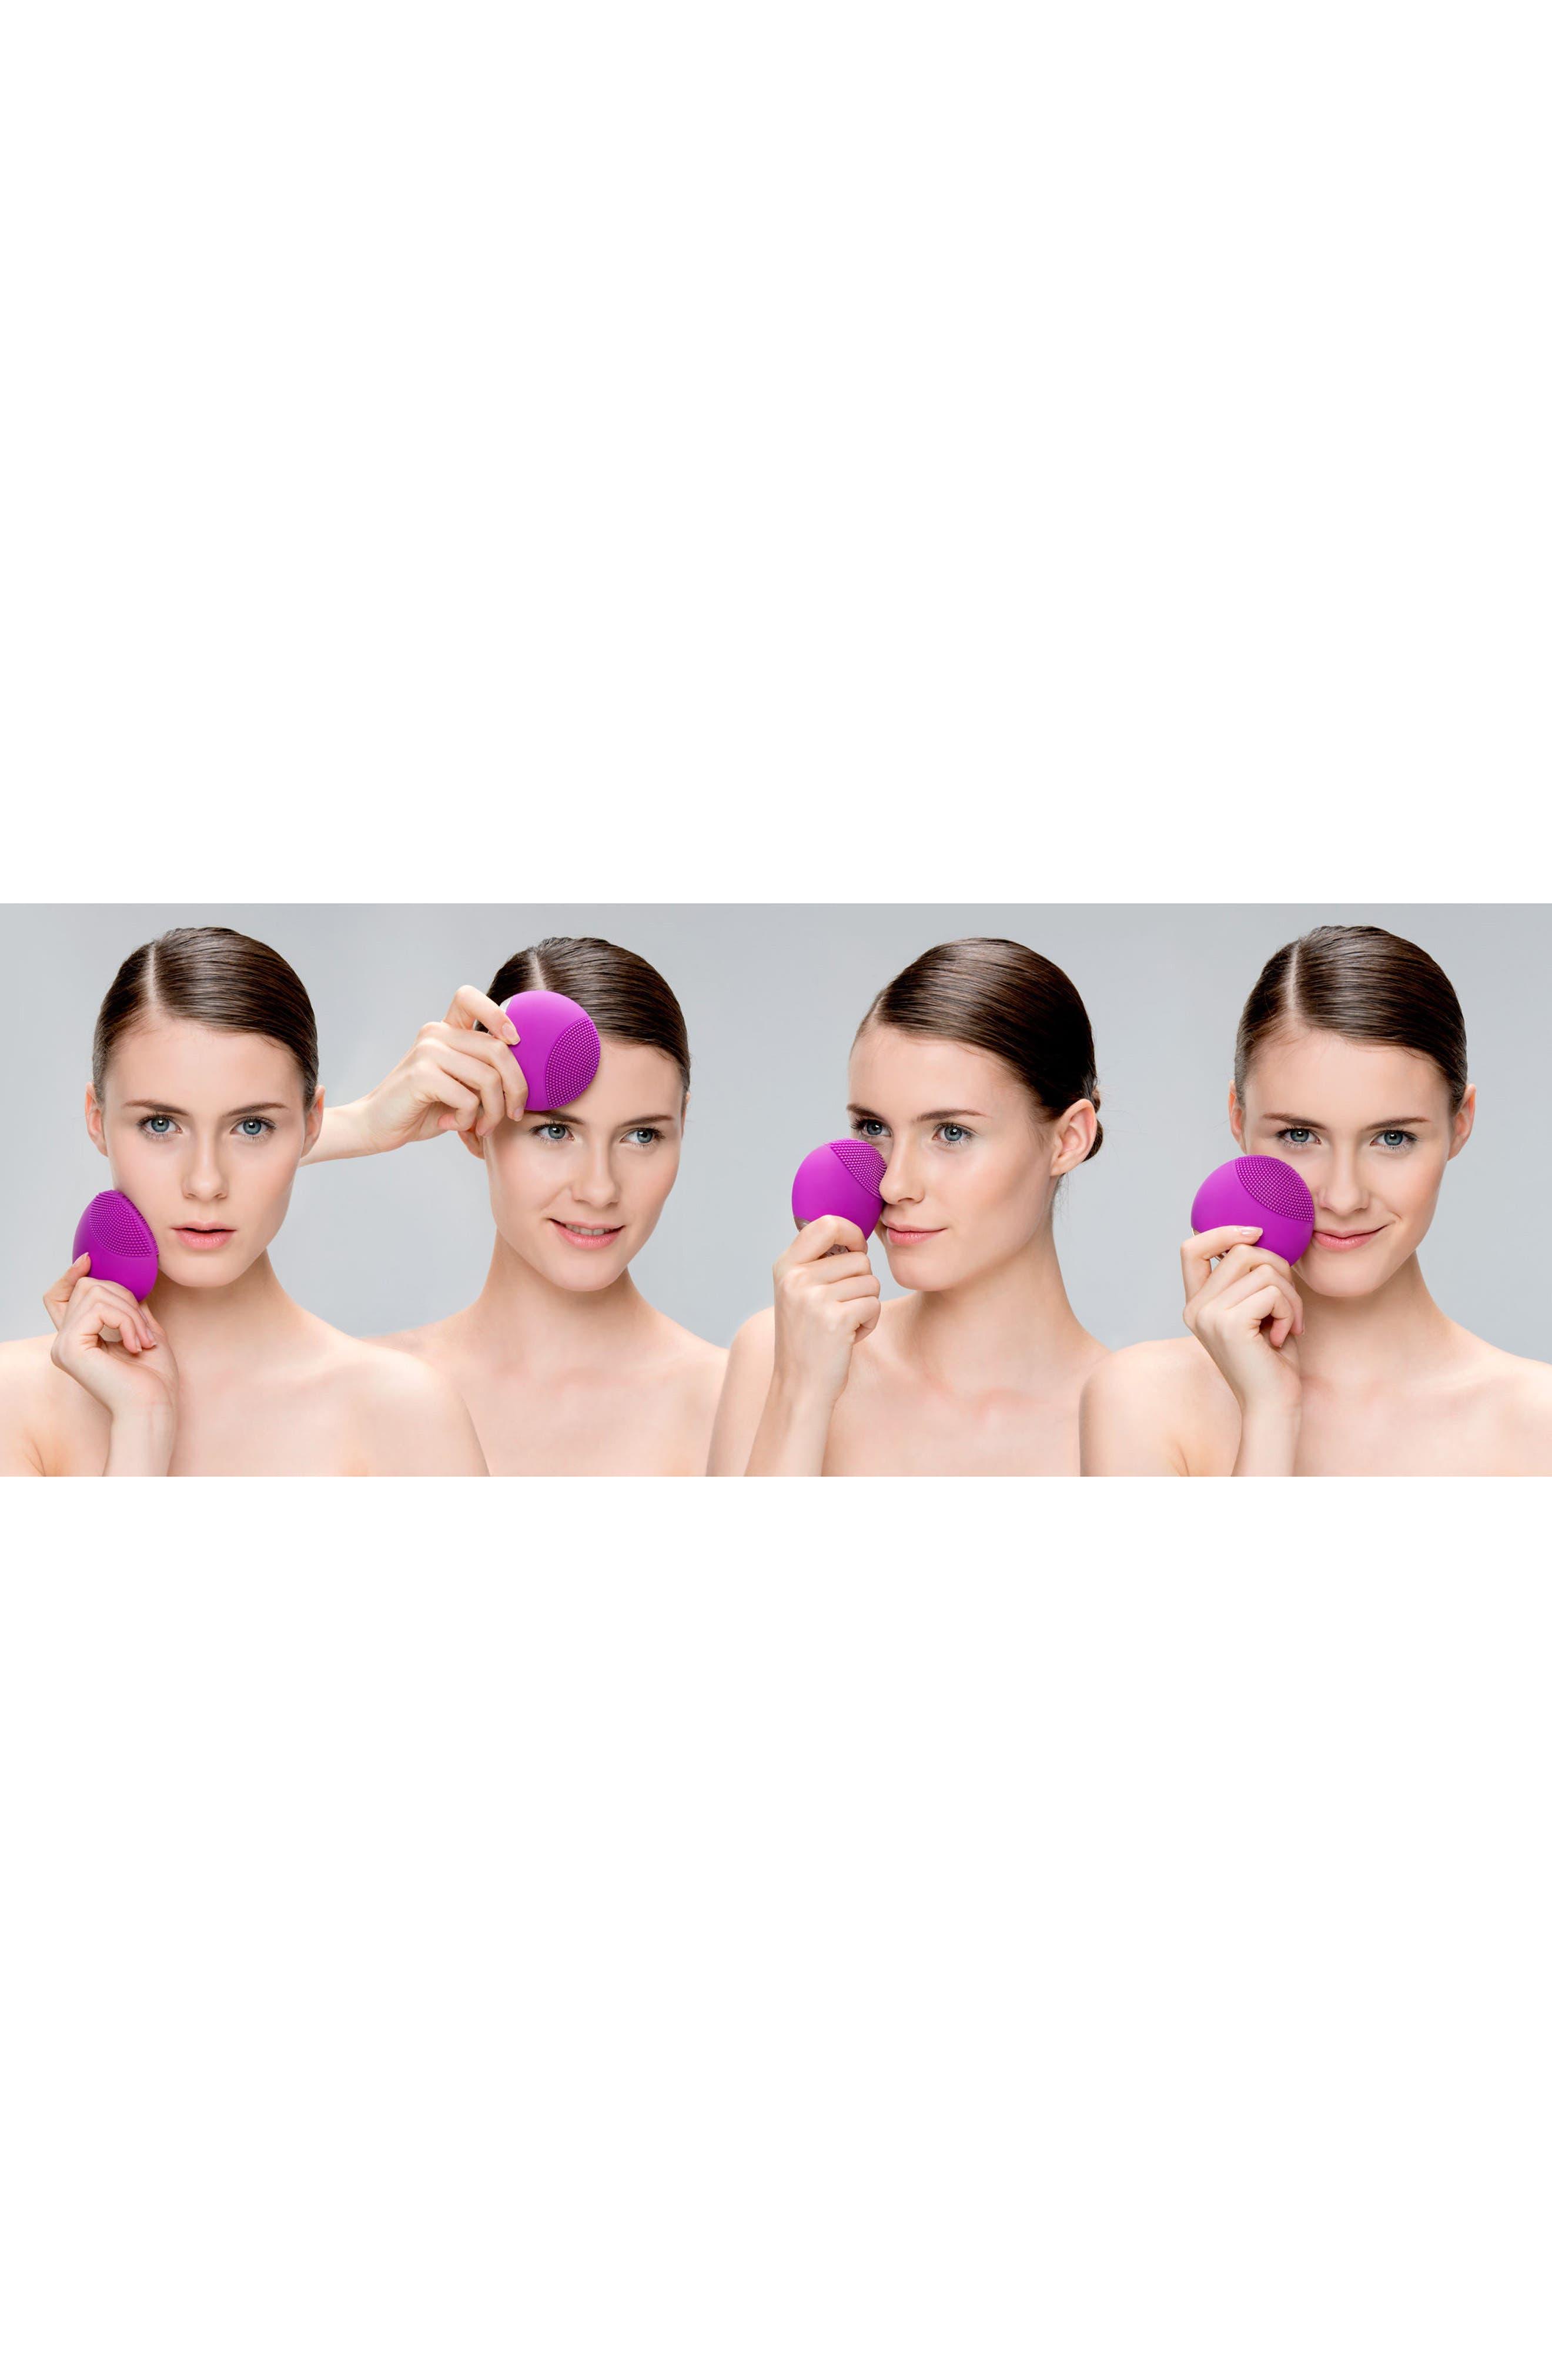 LUNA<sup>™</sup> mini Compact Facial Cleansing Device,                             Alternate thumbnail 4, color,                             PURPLE